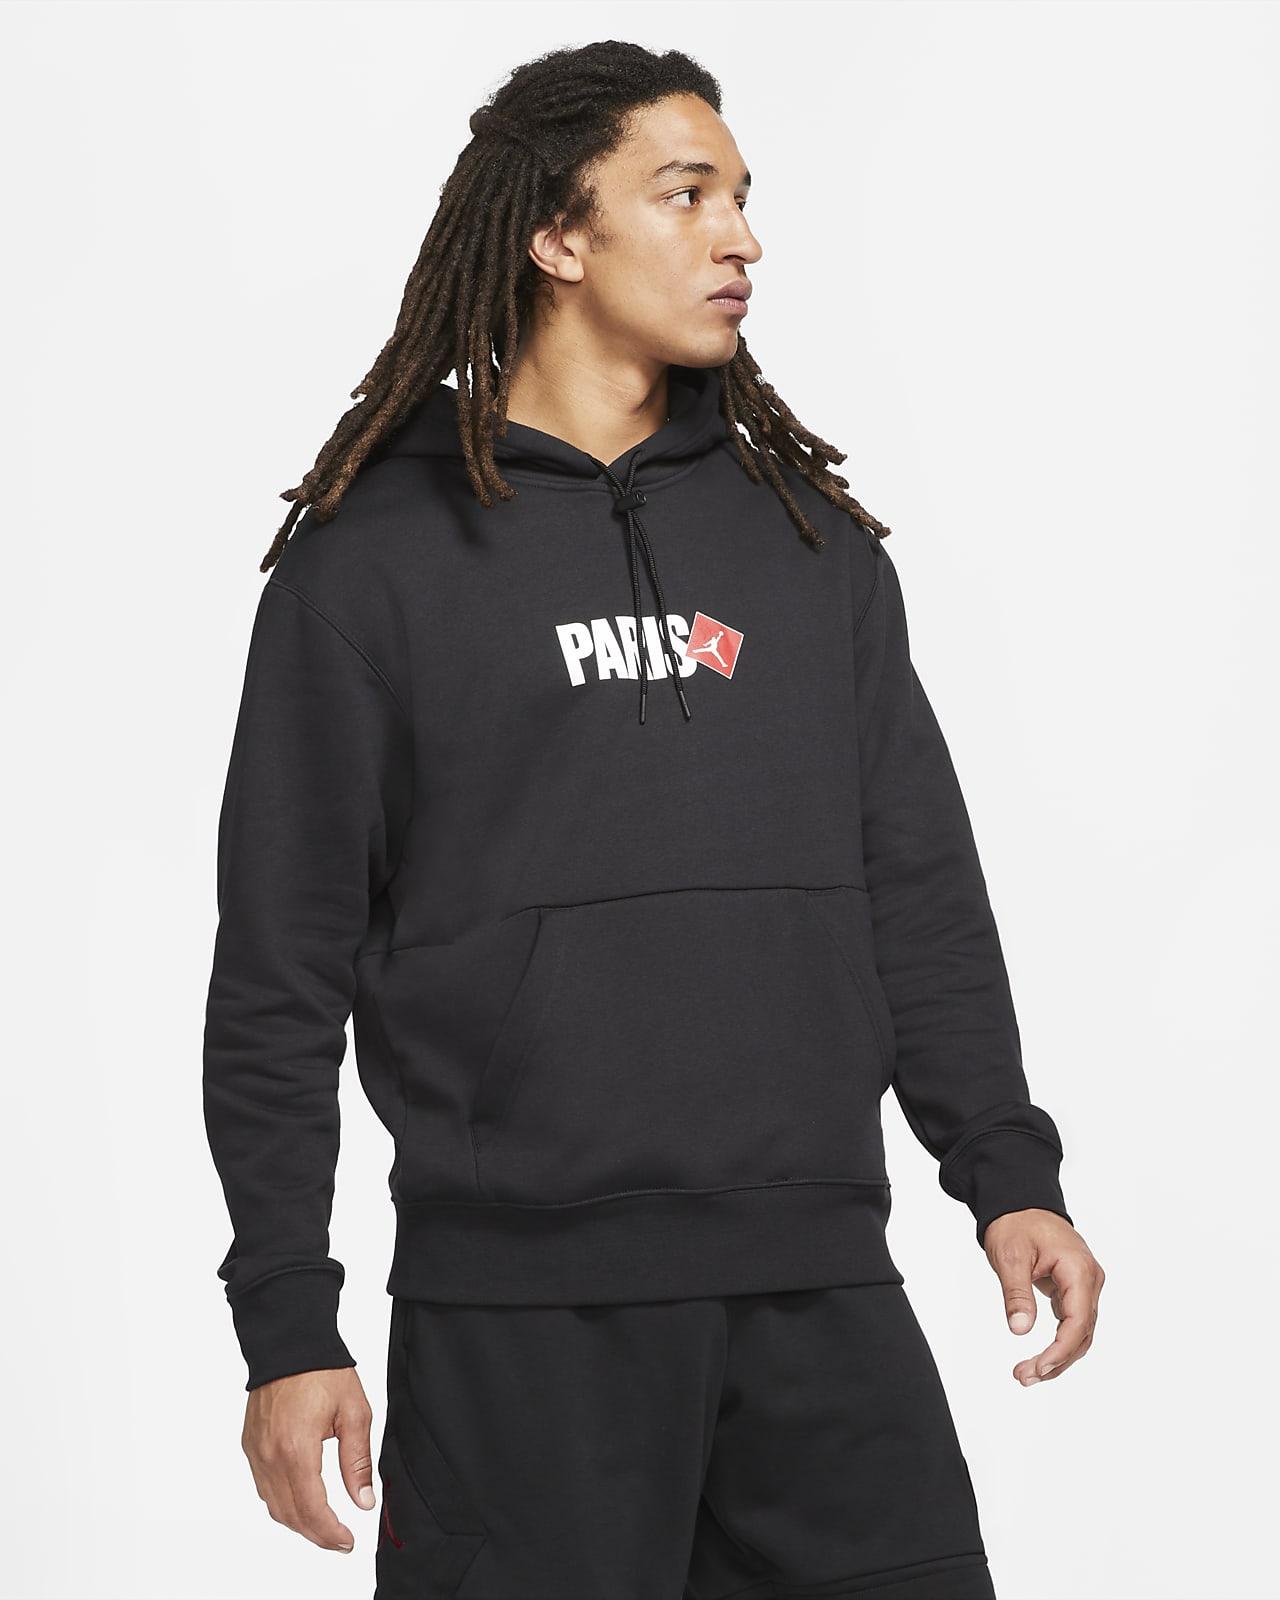 Jordan Paris Men's Pullover Hoodie